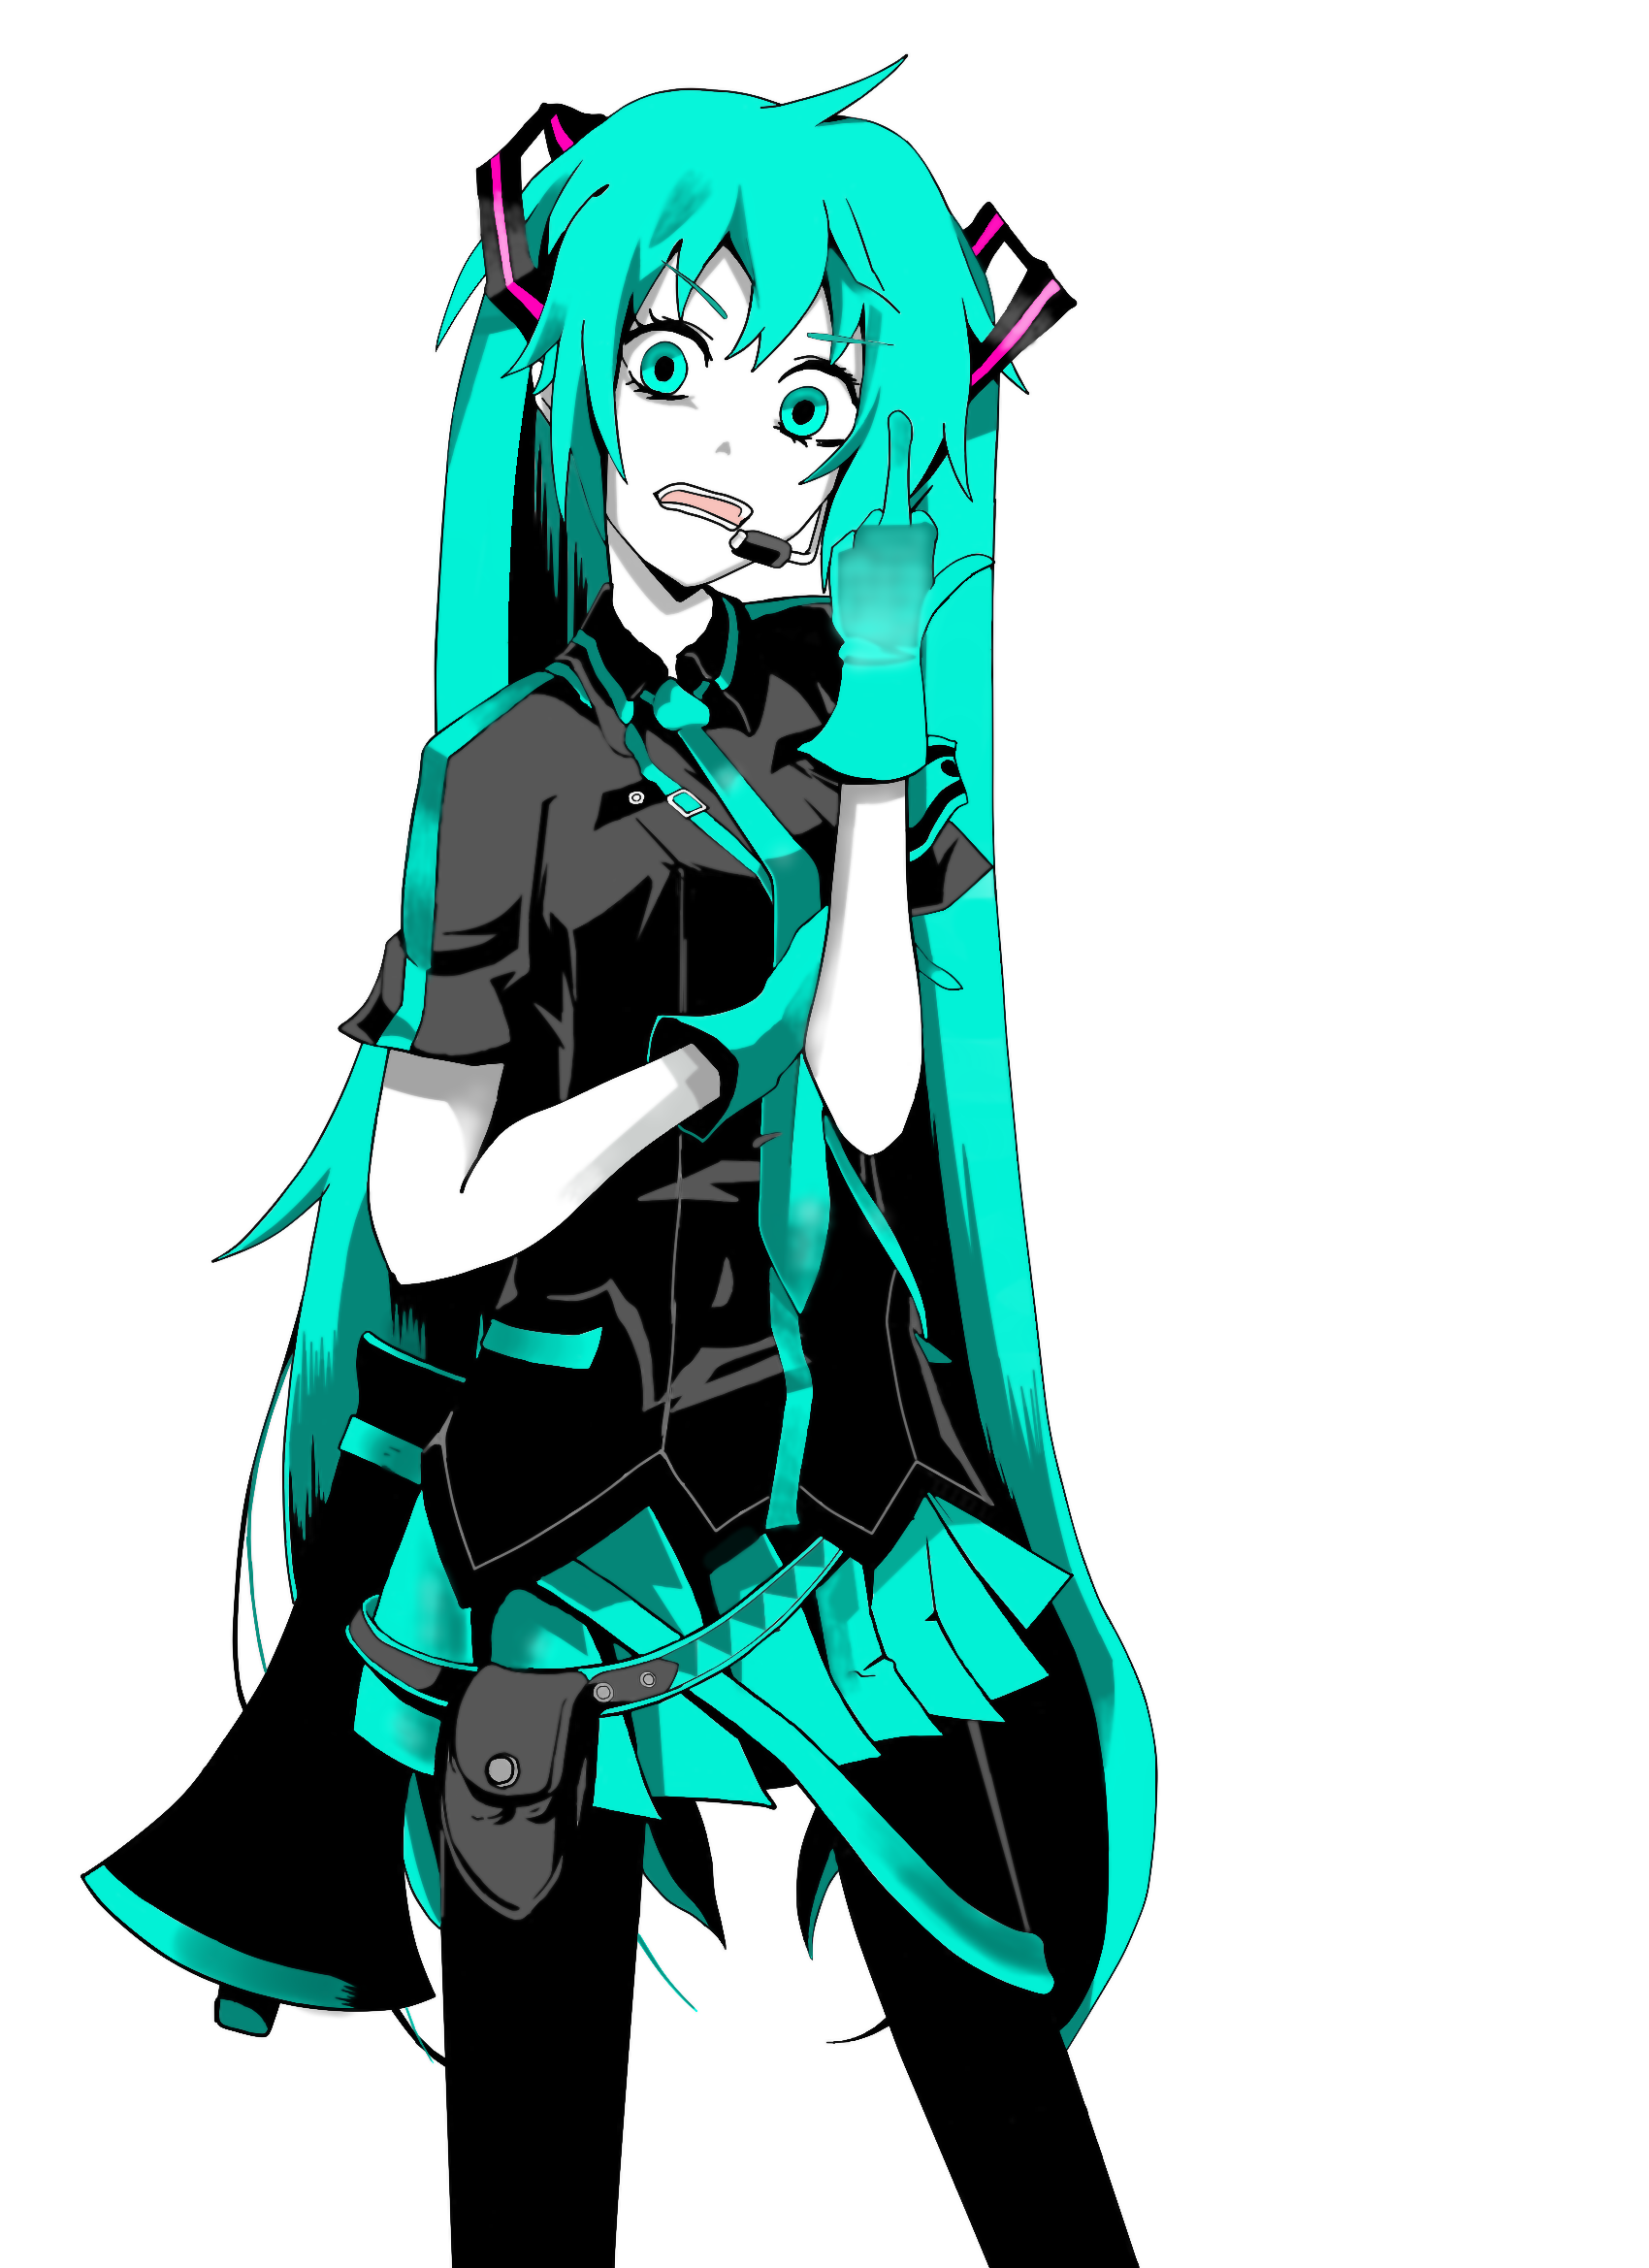 Miku Hatsune Love Is War By Rashek69 On Deviantart